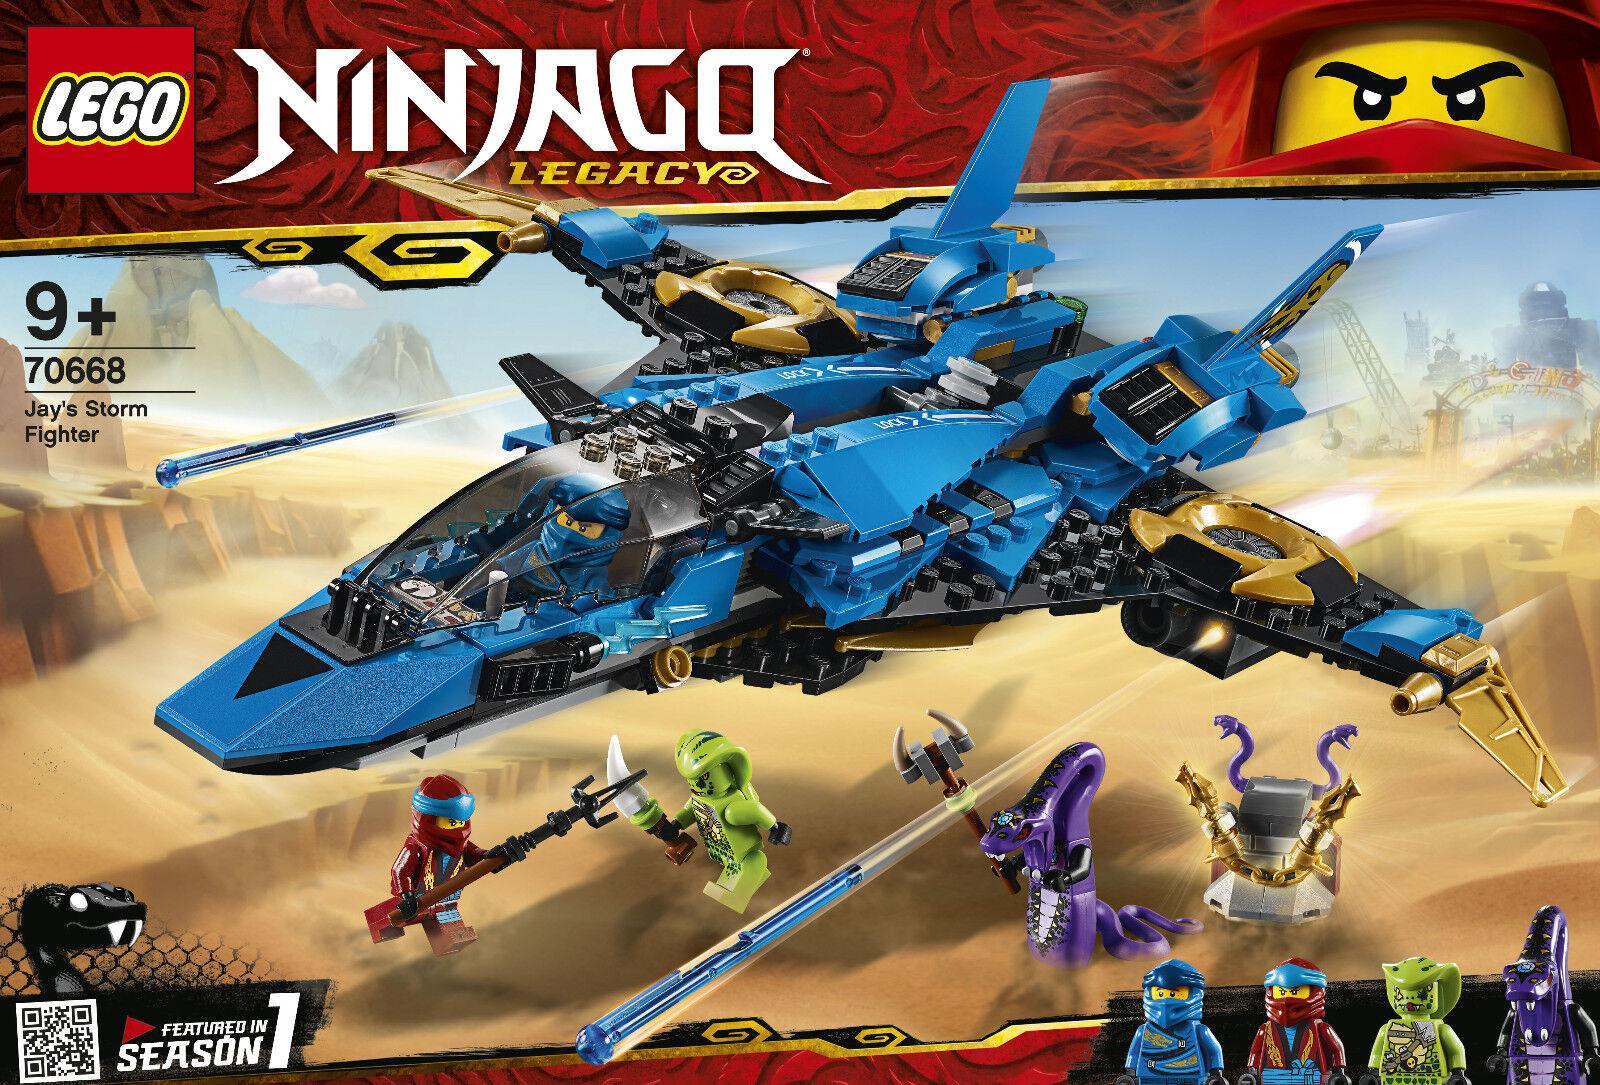 Lego Ninjago 70668 70668 70668 - Jays Donner-Jet,Neuf Embal. Origine cc52da